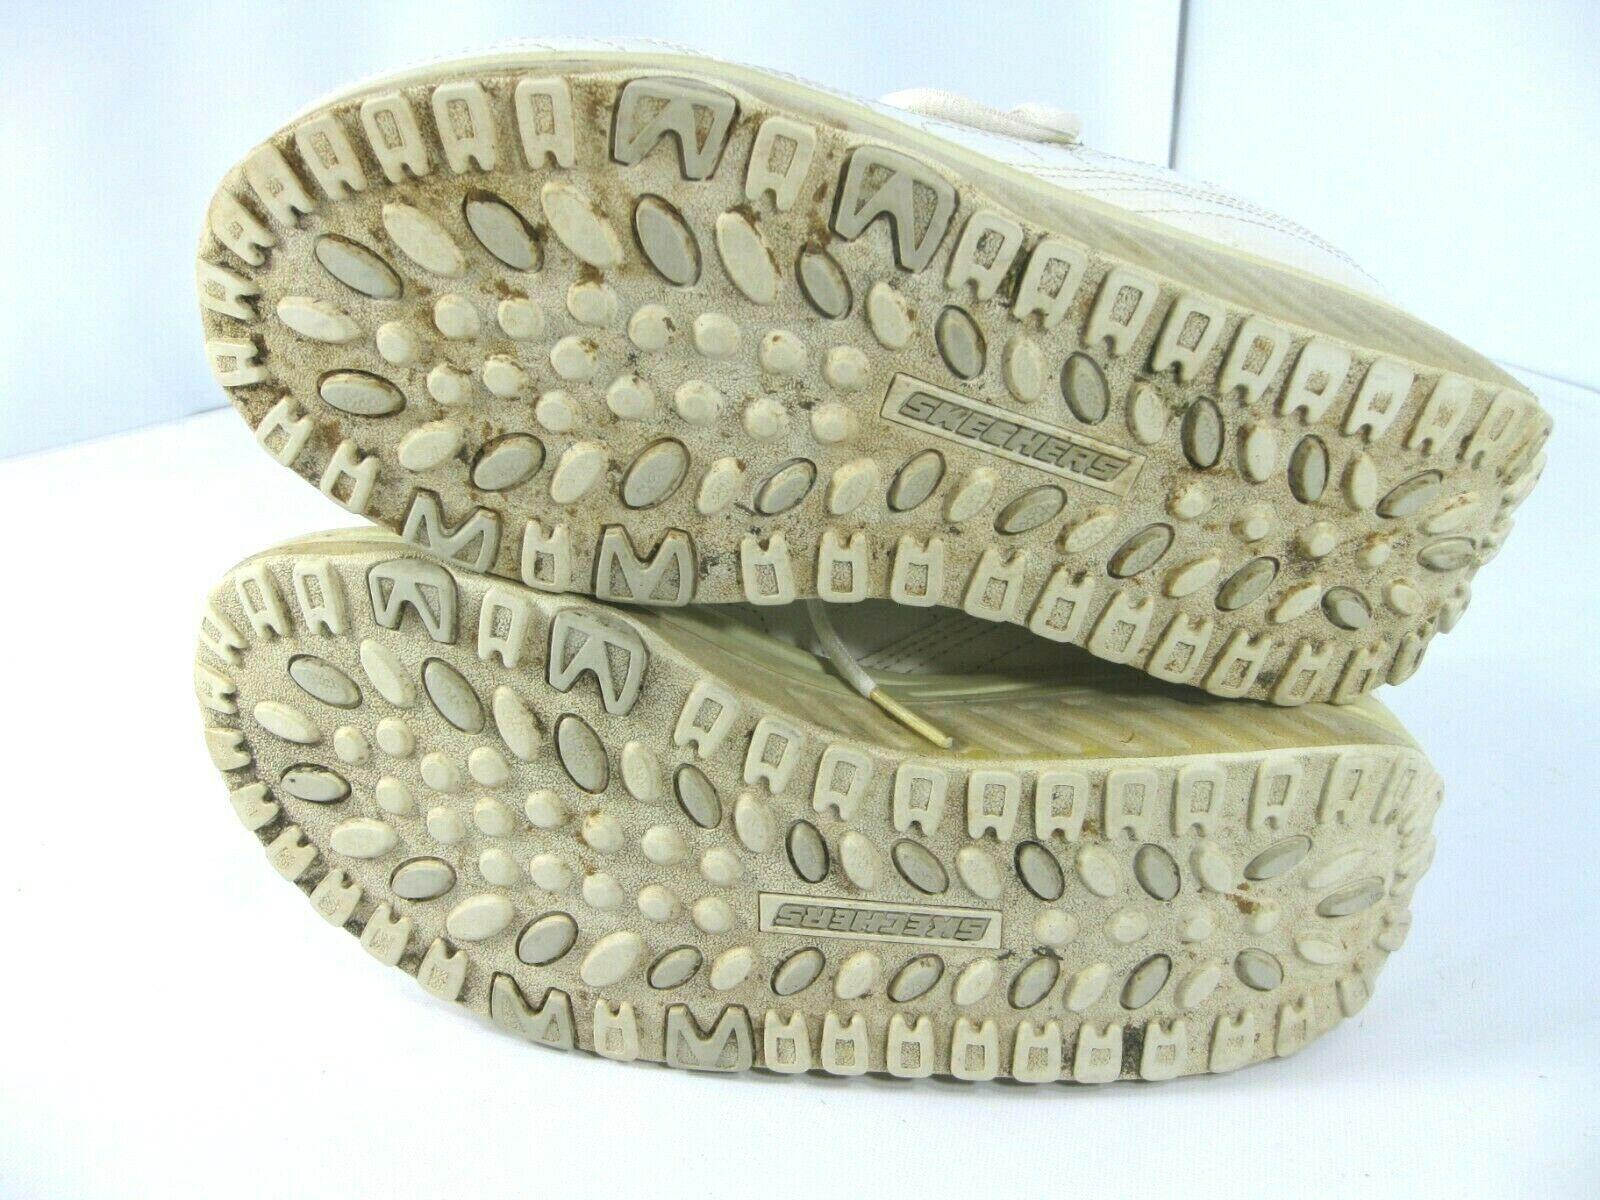 Sketcher Shape Ups Womens Size 8 White 11800 Fitness Sneaker Walking Shoes image 5